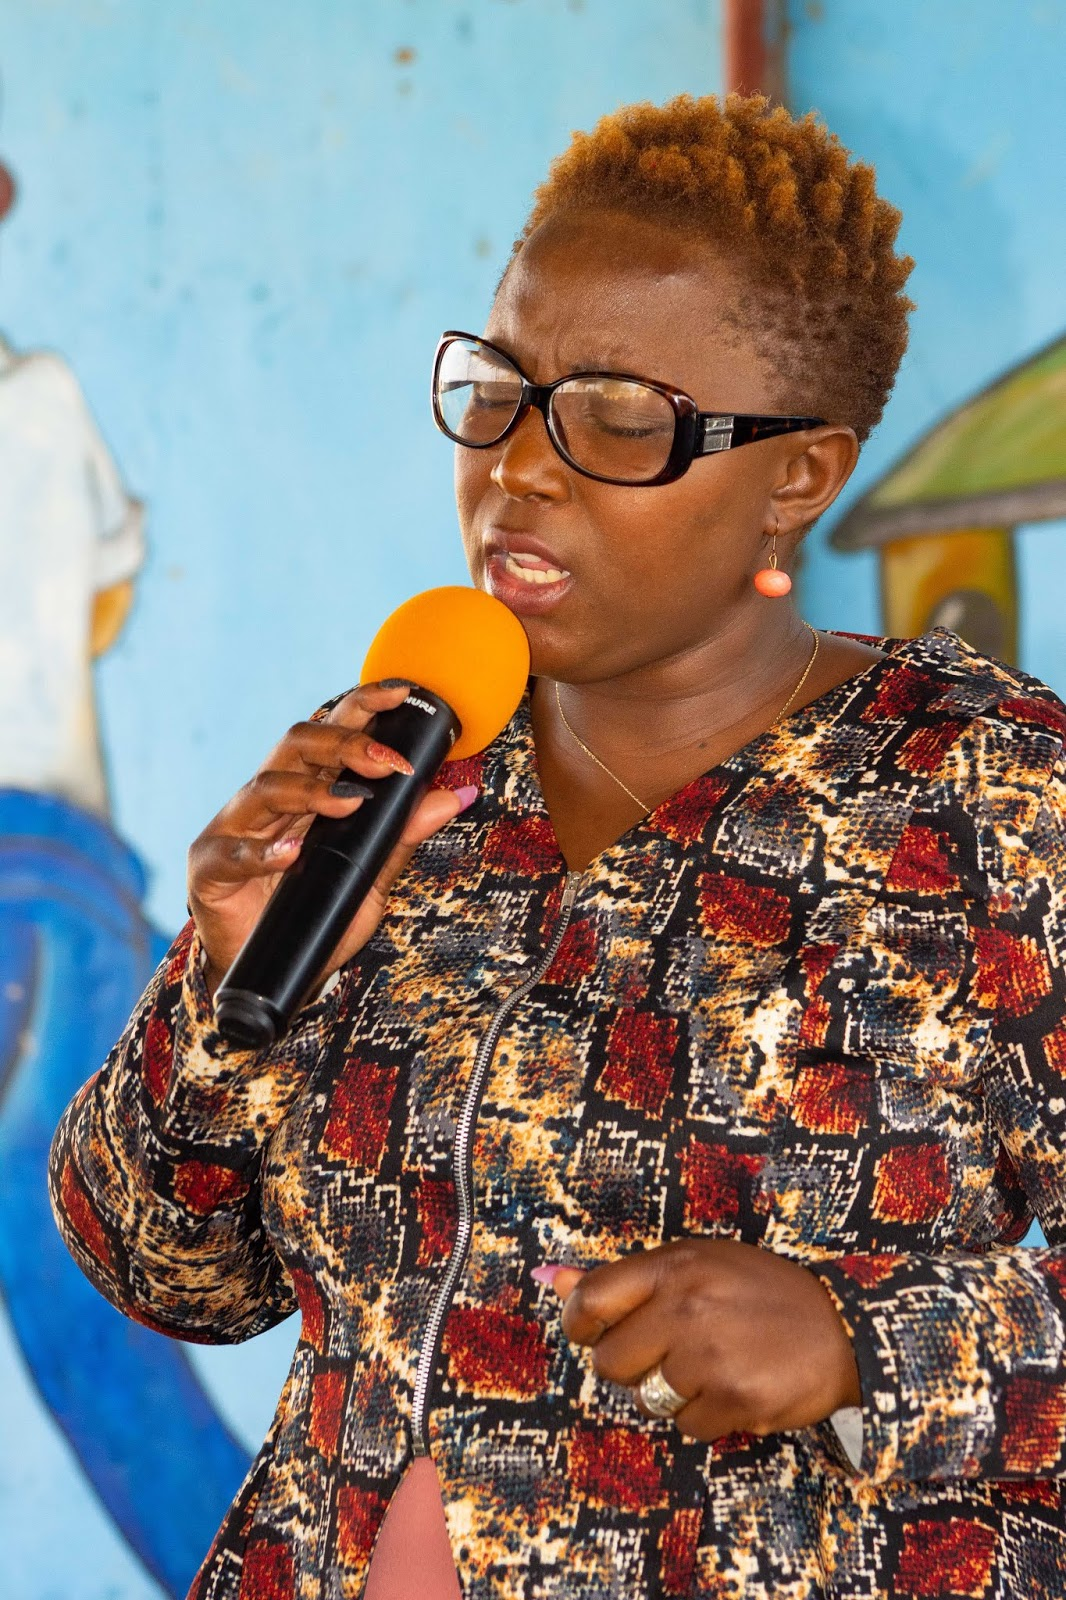 Prophetess Anna Tendai Sibiya